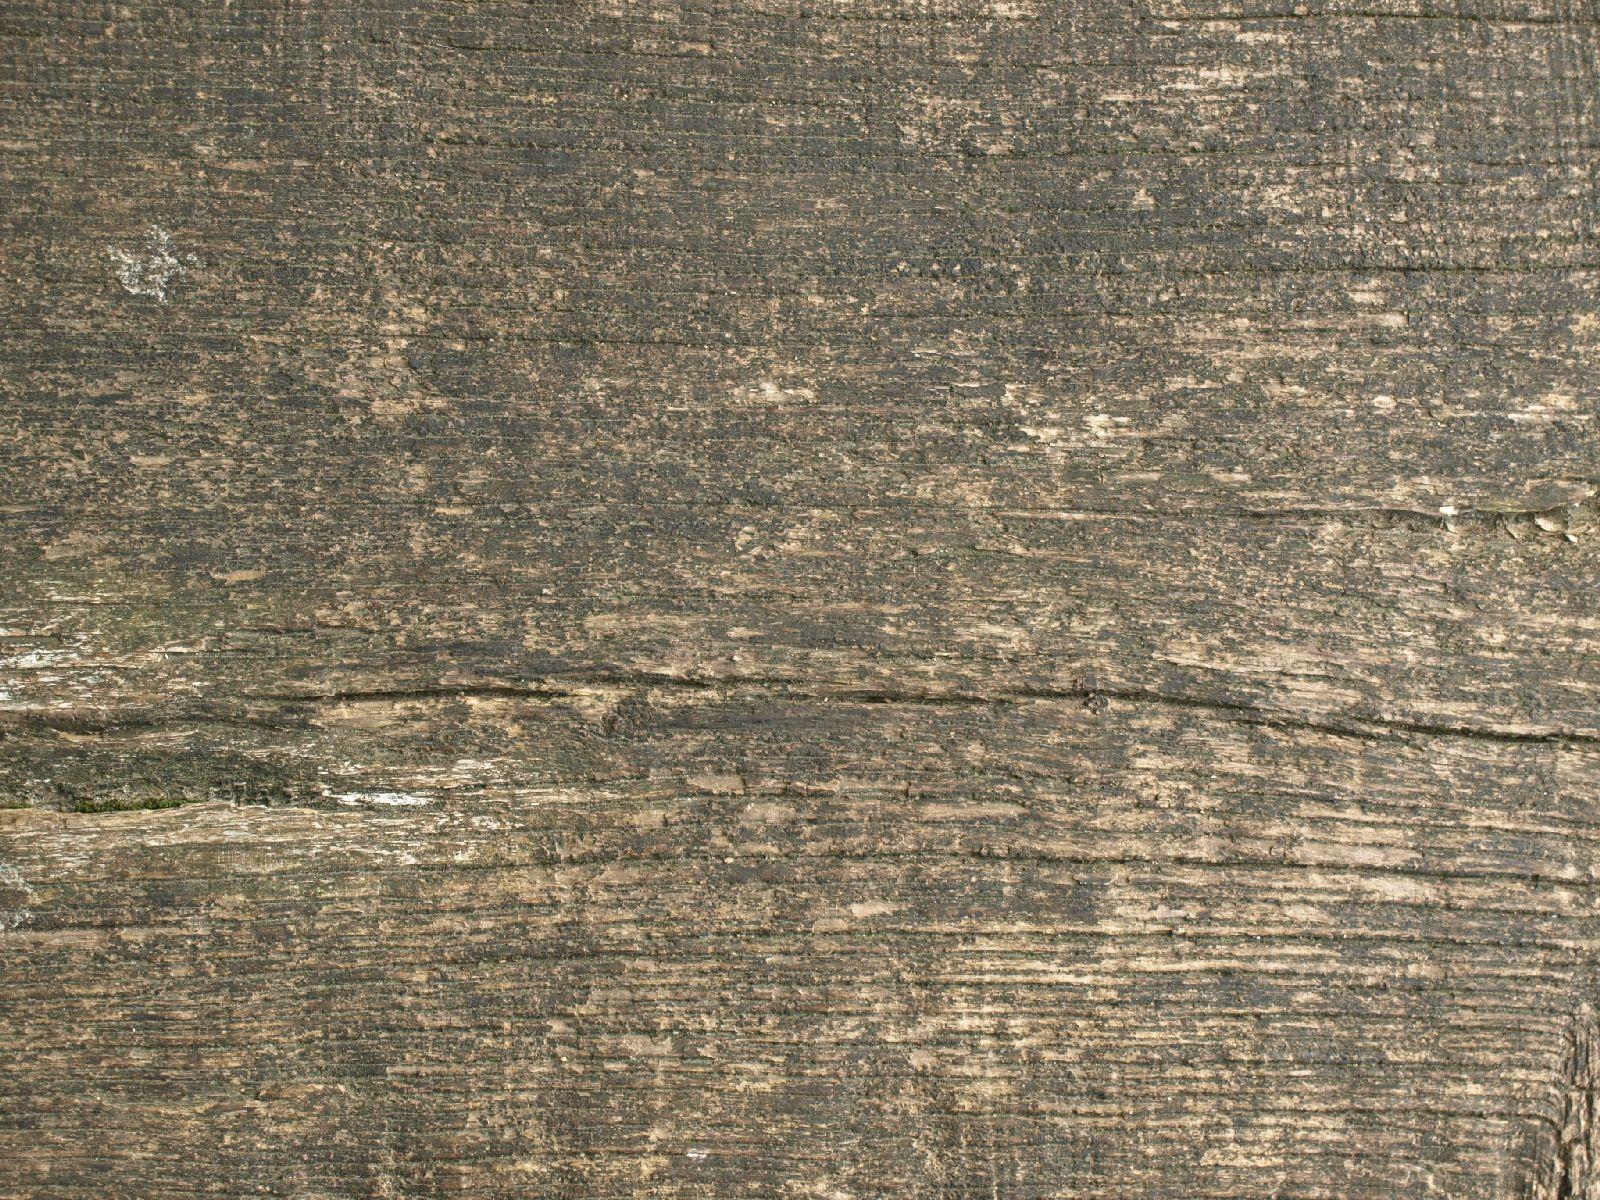 Wood_Texture_A_P8299311